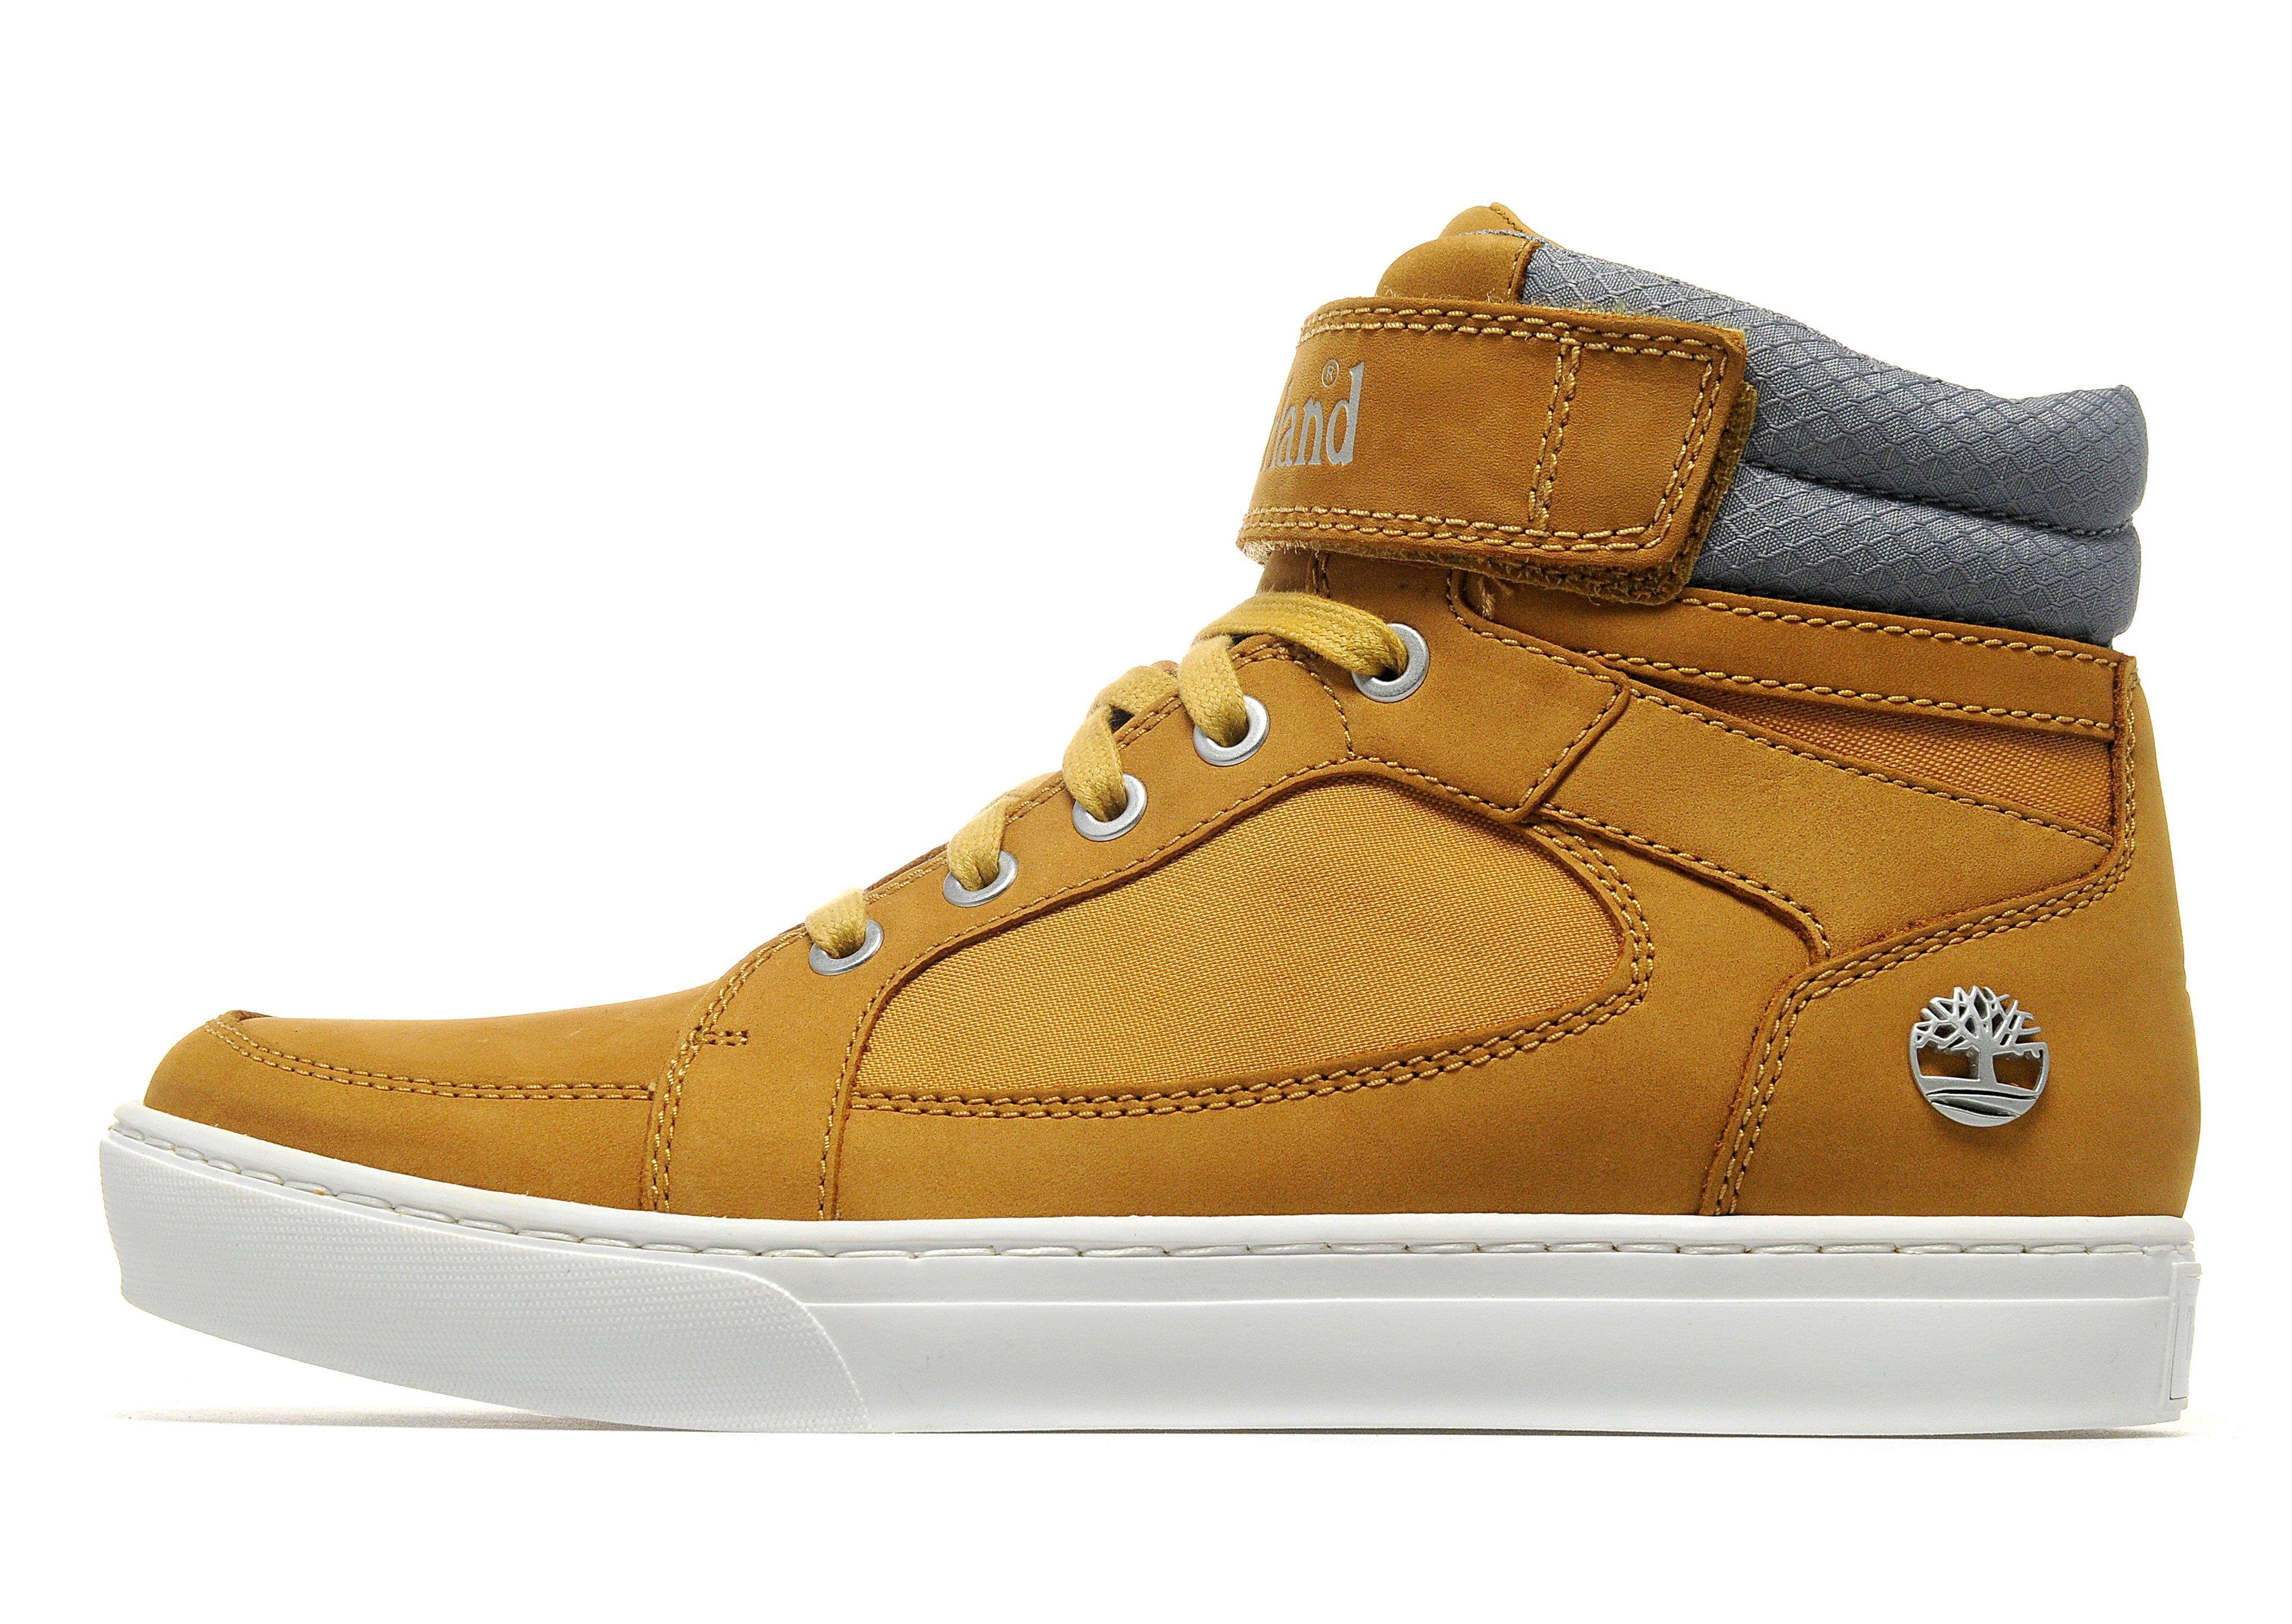 Topshop Shoes Review